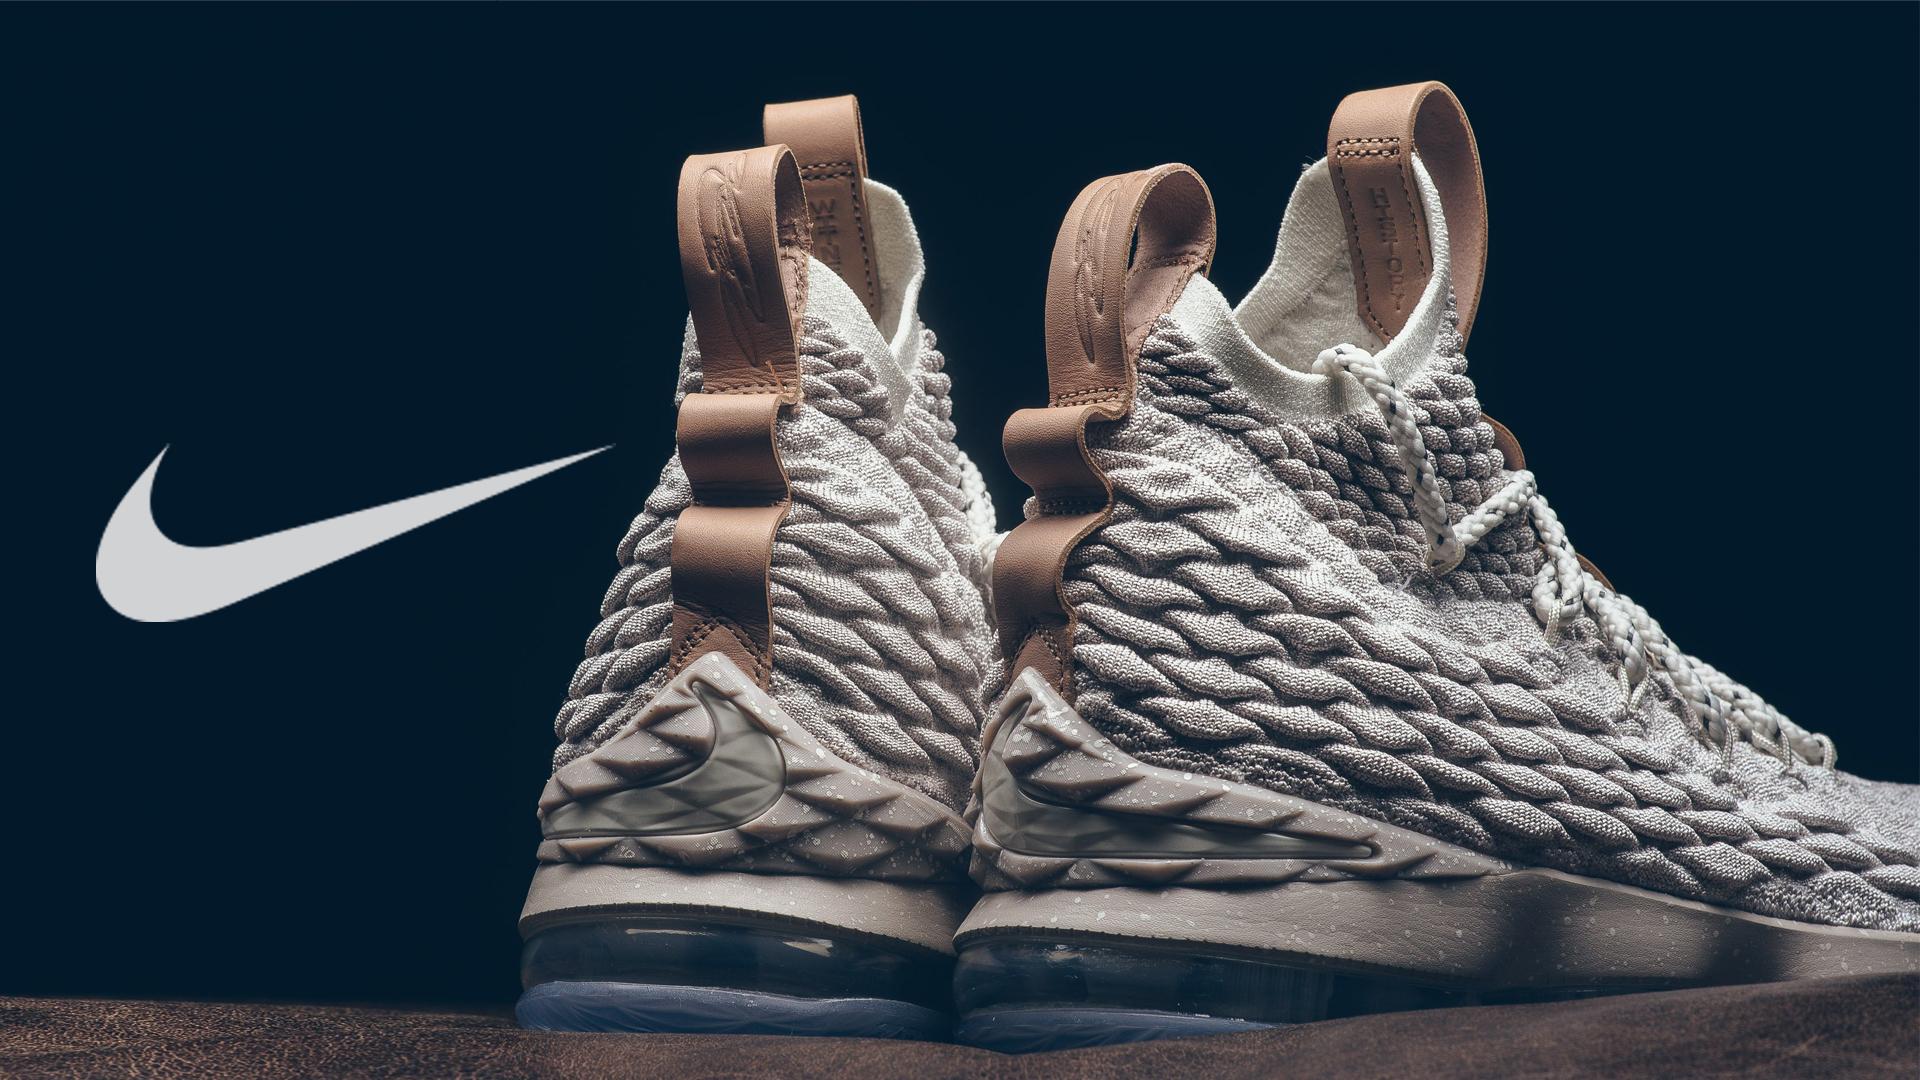 Nike Basketball Hd Wallpaper Lebron James Shoes Wallpaper With Nike Lebron 15 Rear View